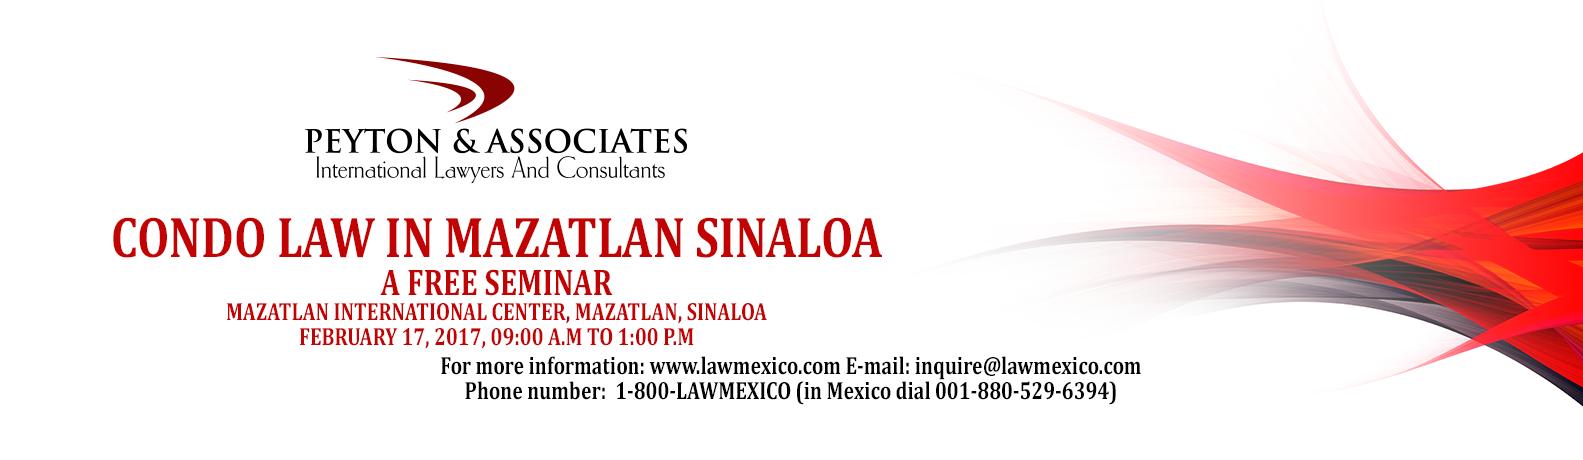 condo-law-in-mazatlan-sinaloa-a-free-seminar-